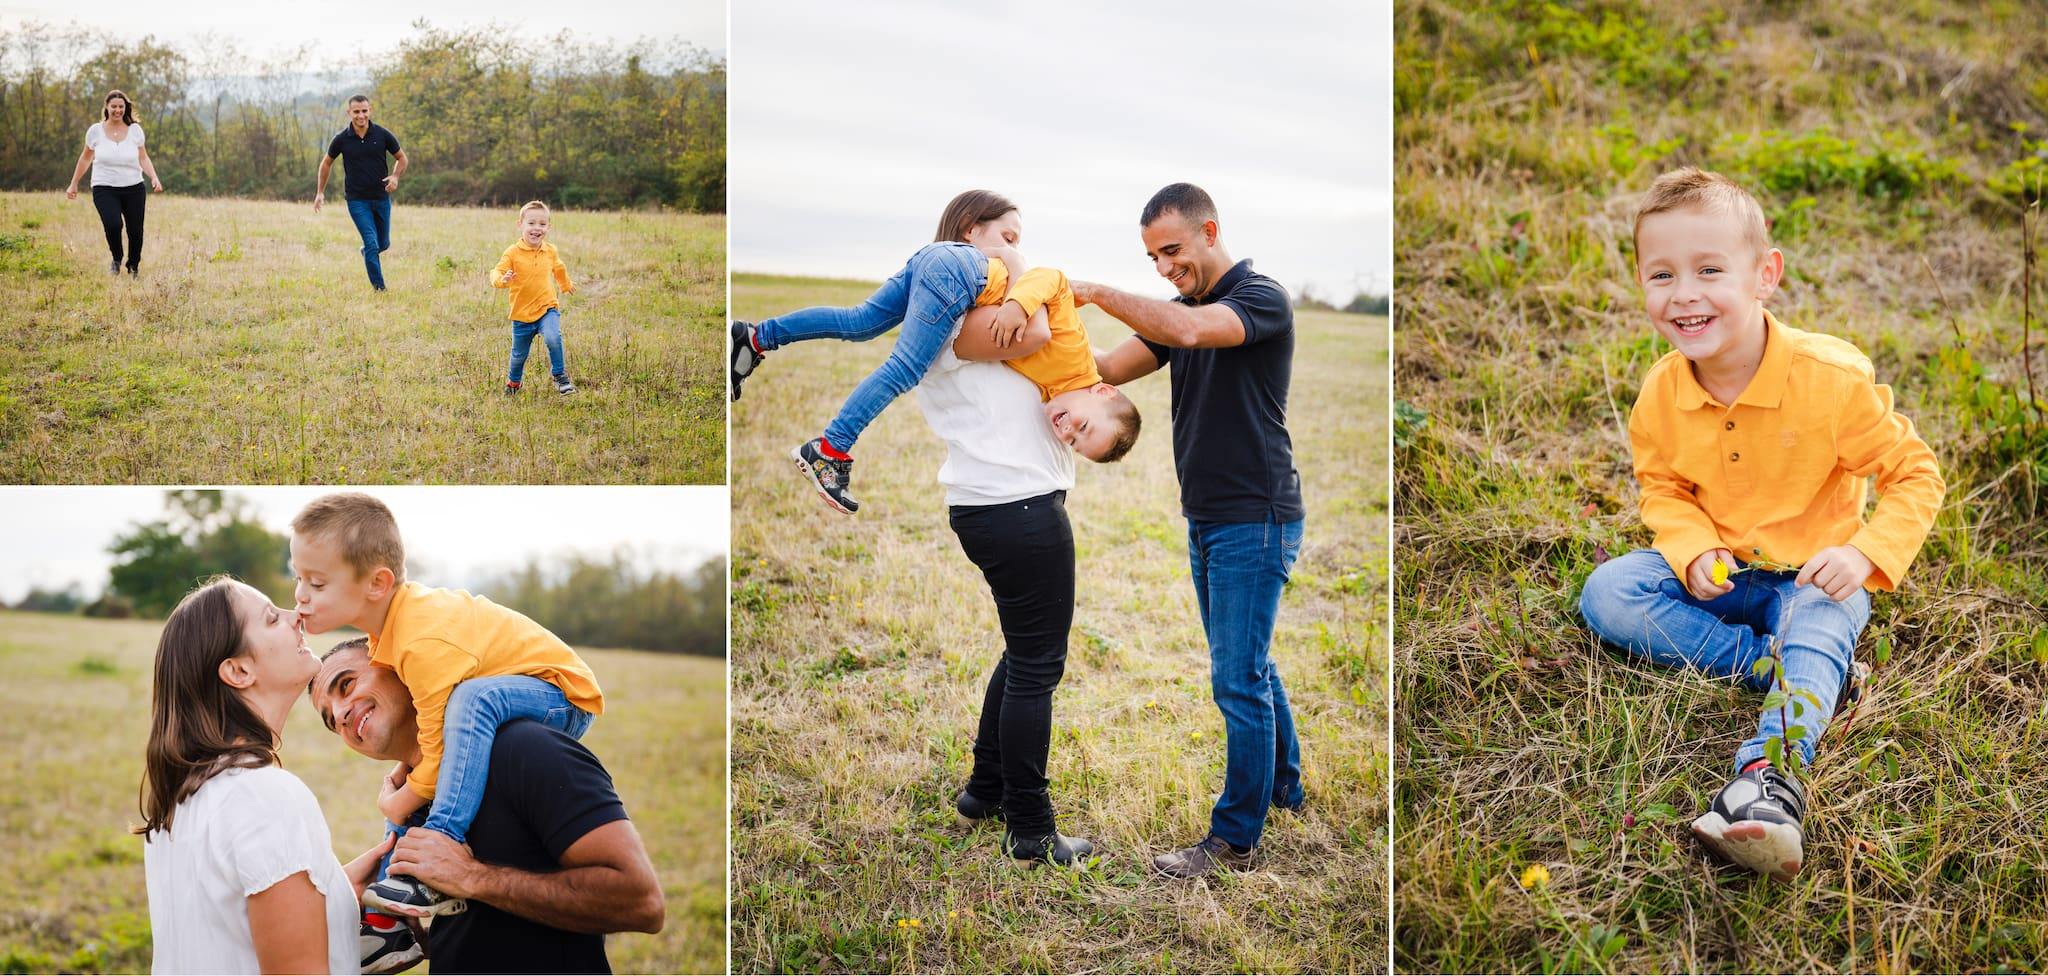 genas ; photographe de famille ; photographe de mariage